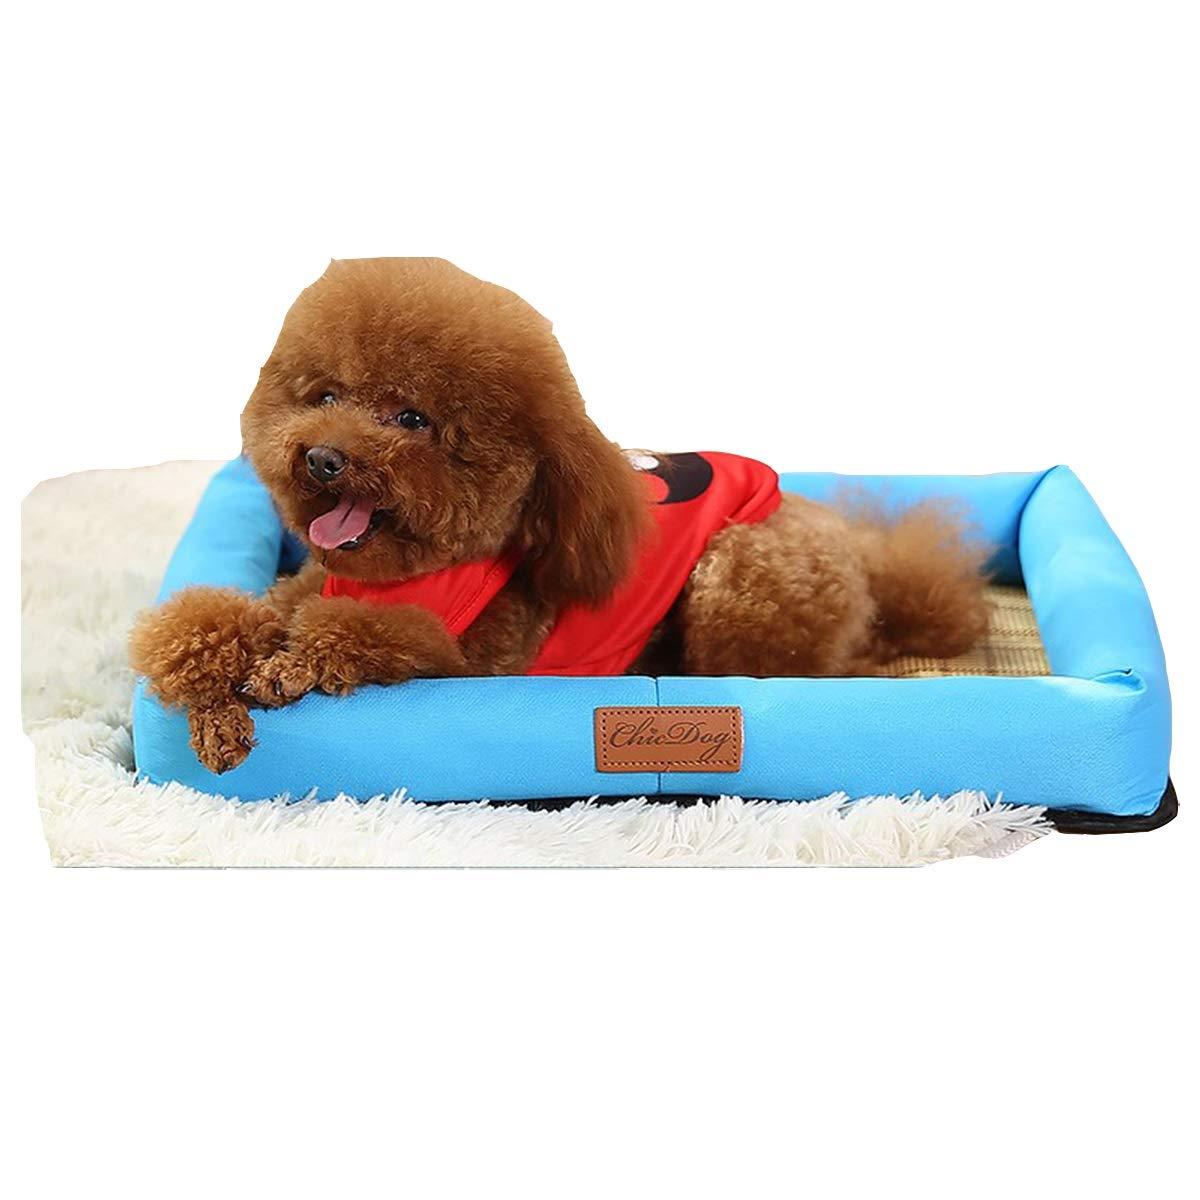 bluee S bluee S Kennel Summer Cool Nest, Small Dog Kennel, Summer Cool Mat Bed, Medium Dog, Pet Cat Litter, bluee Bamboo Charcoal Mat Pet Nest (color   bluee, Size   S)